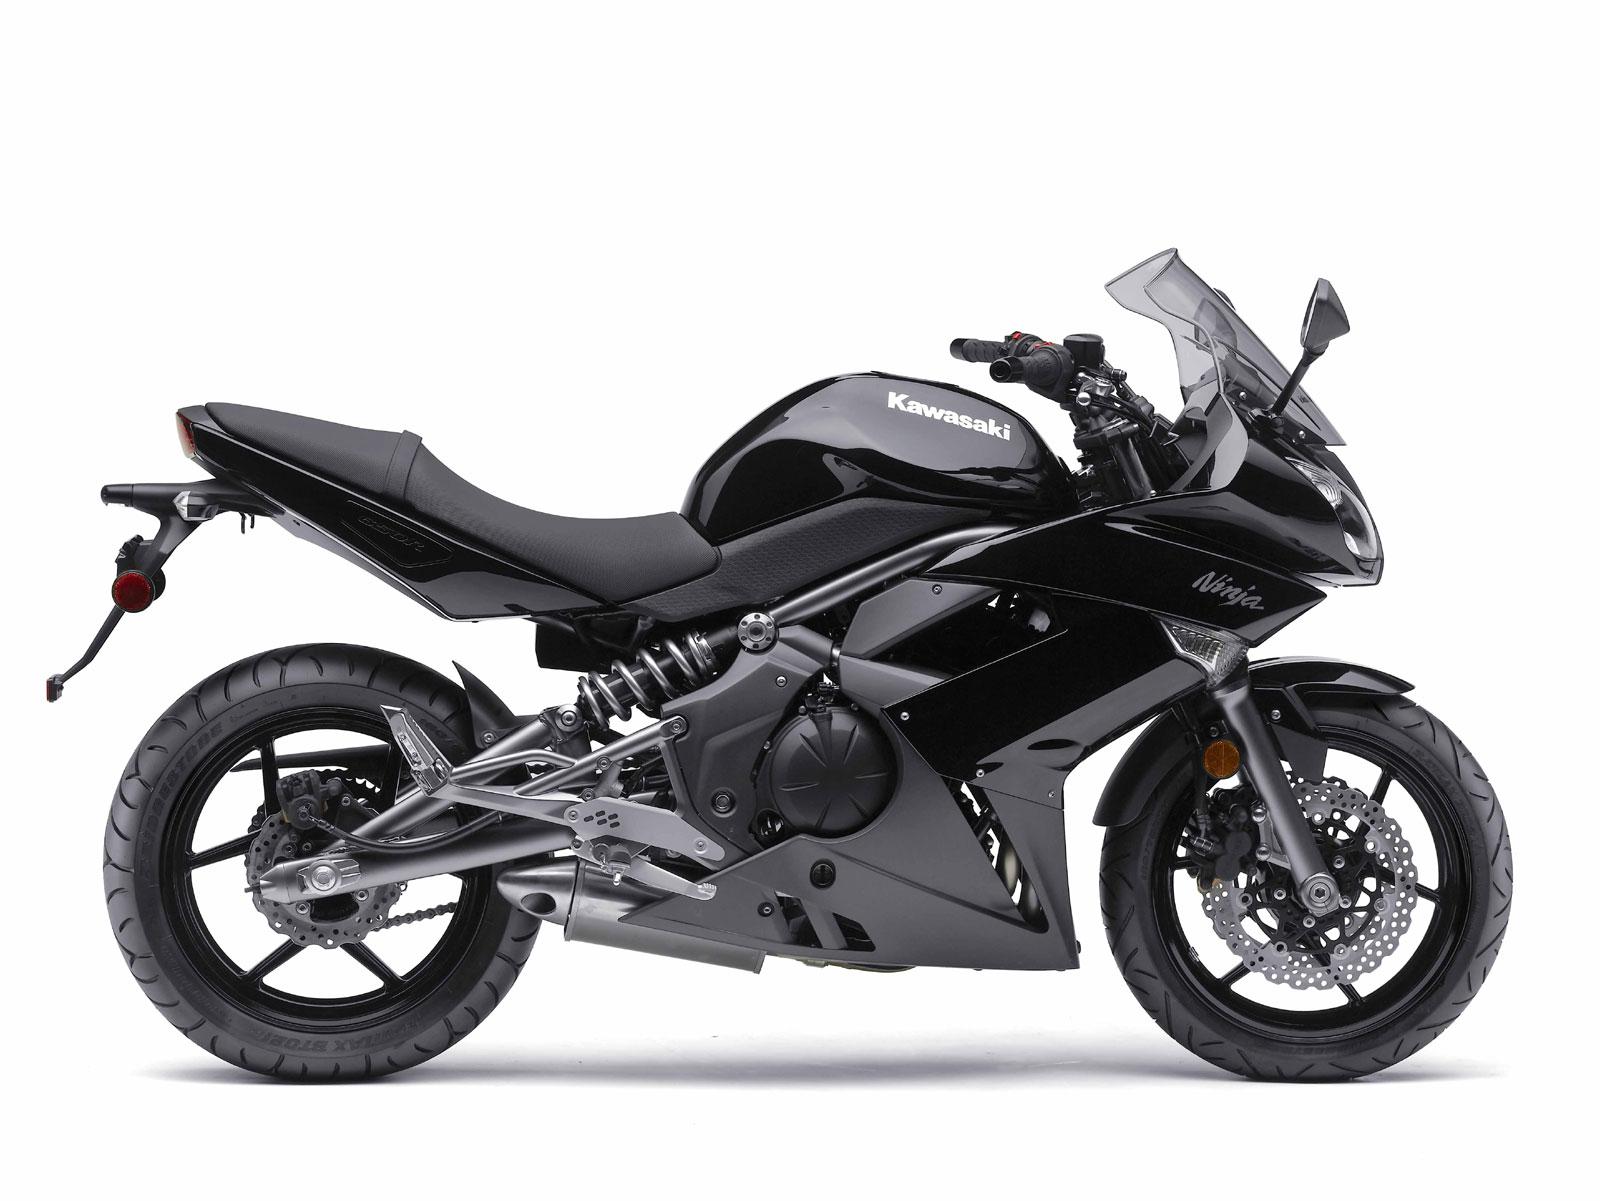 10 great beginner motorcycles to get you started – adventure seeker